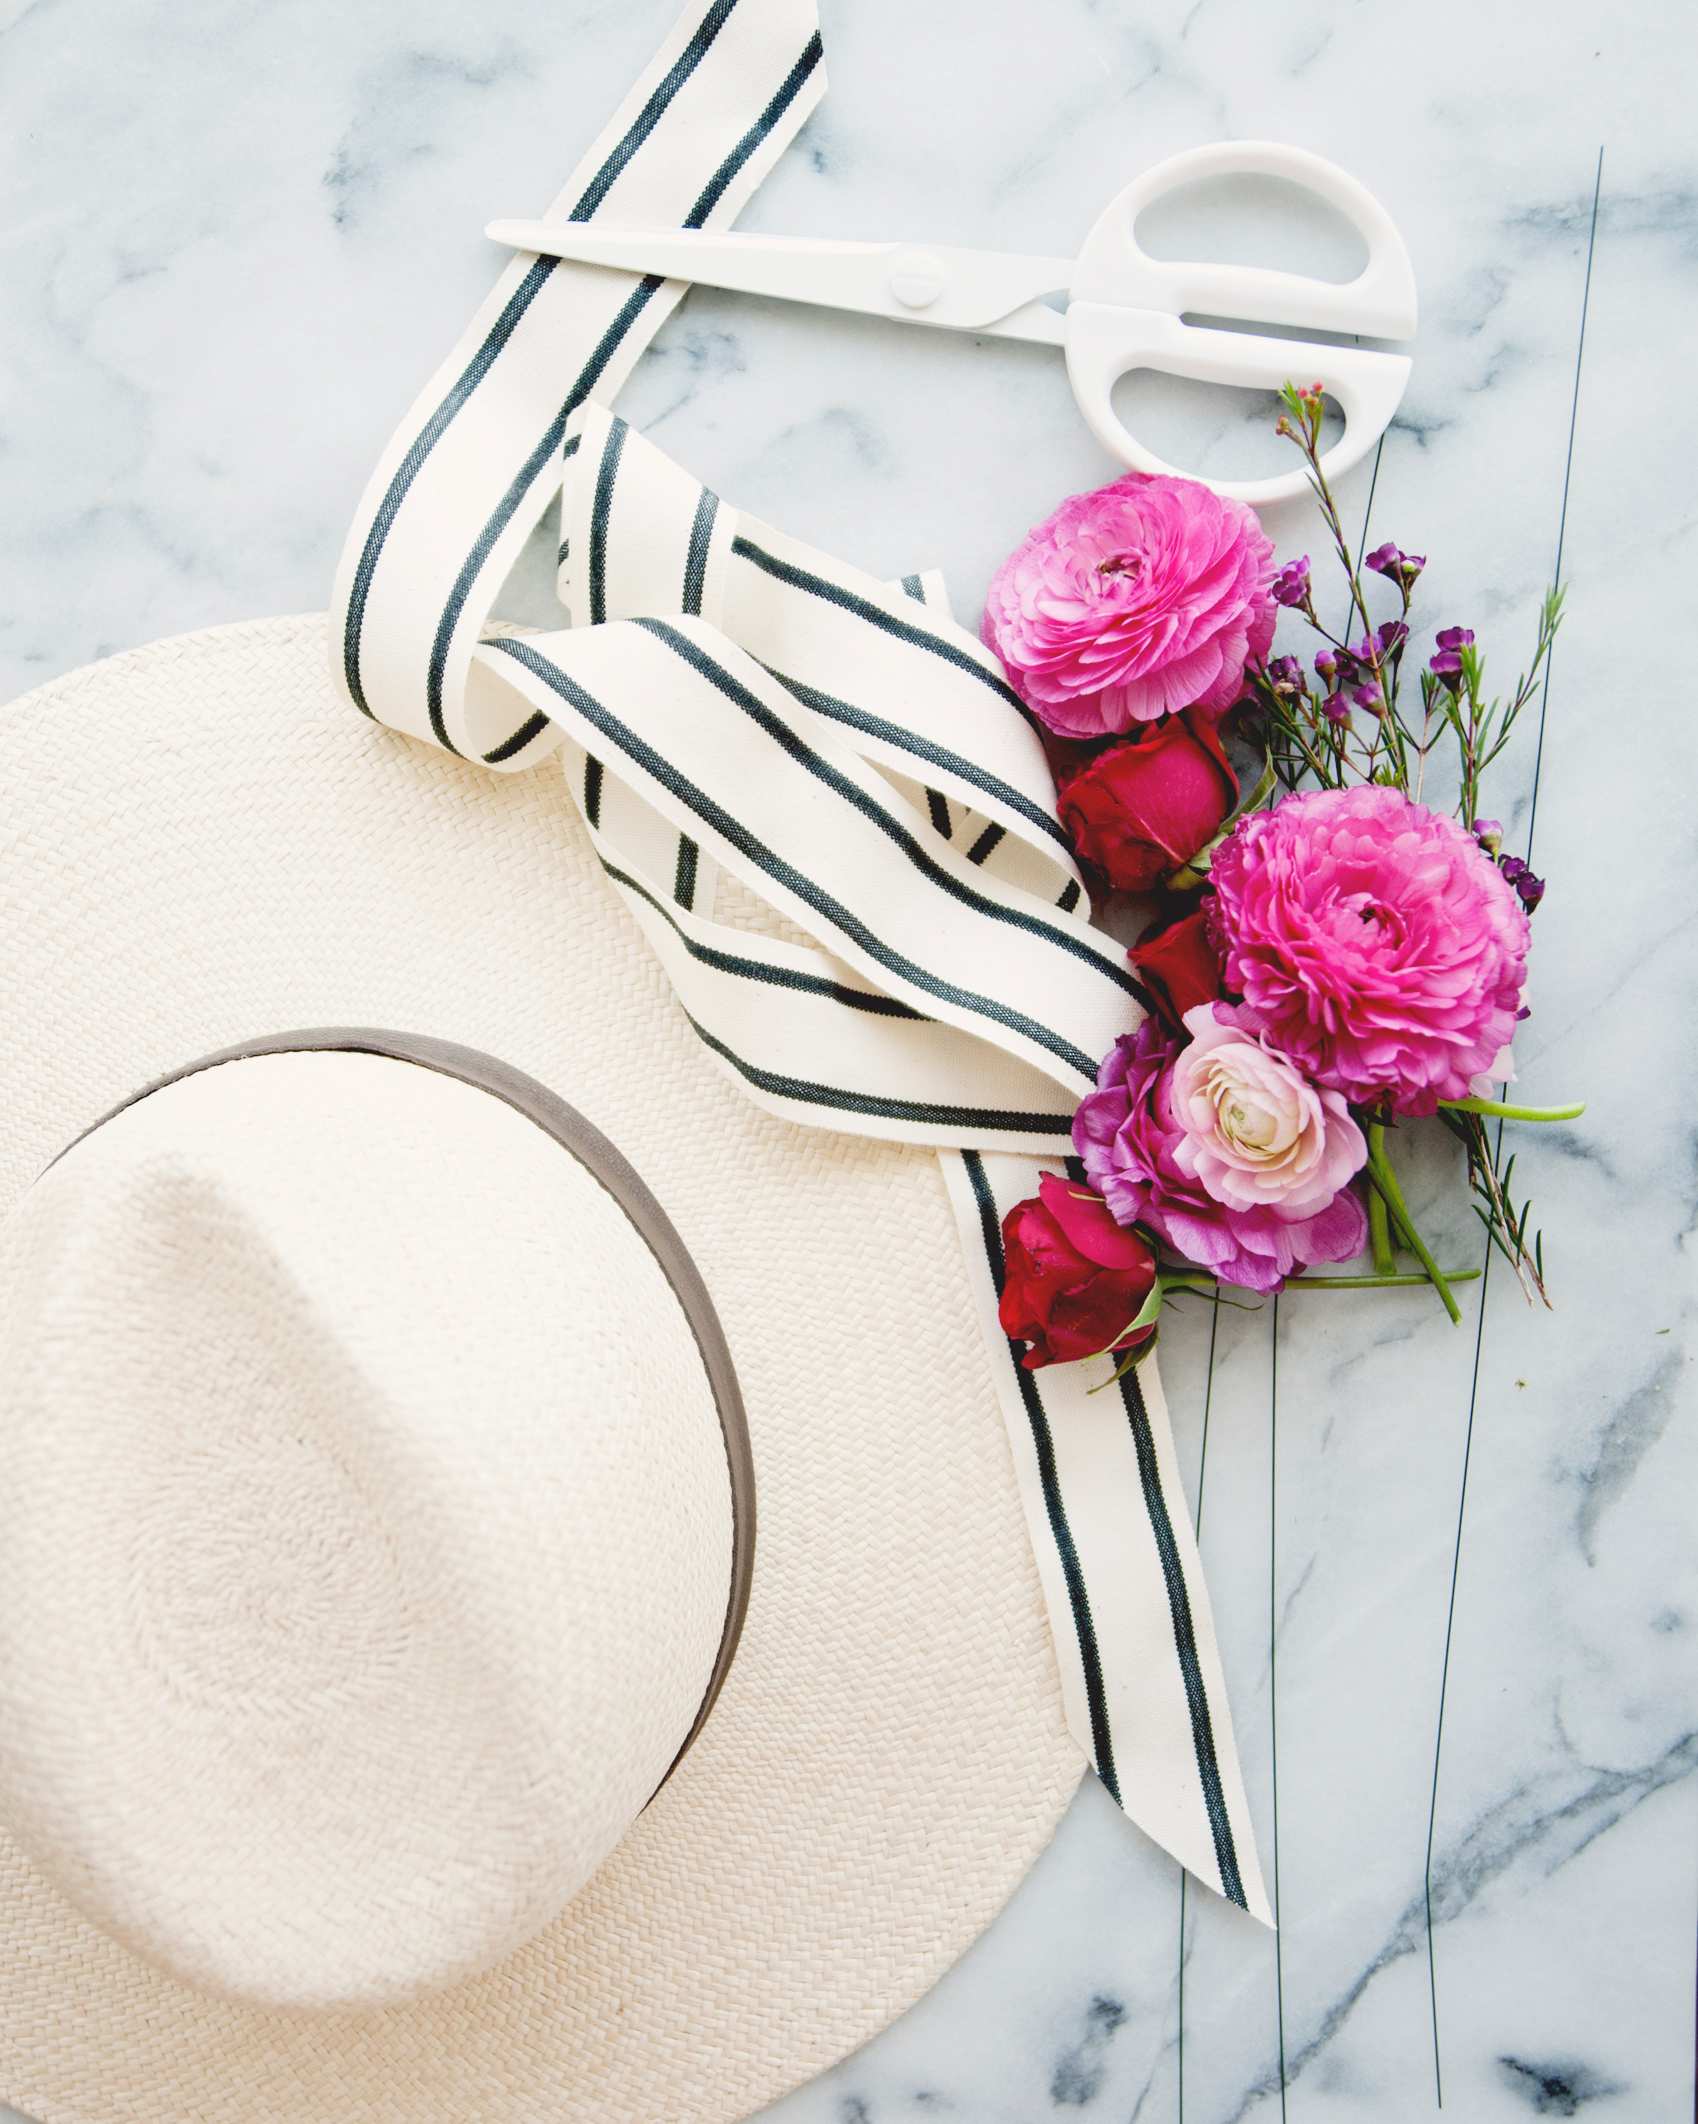 claire-thomas-bridal-shower-derby-diy-hat-materials-0814.jpg